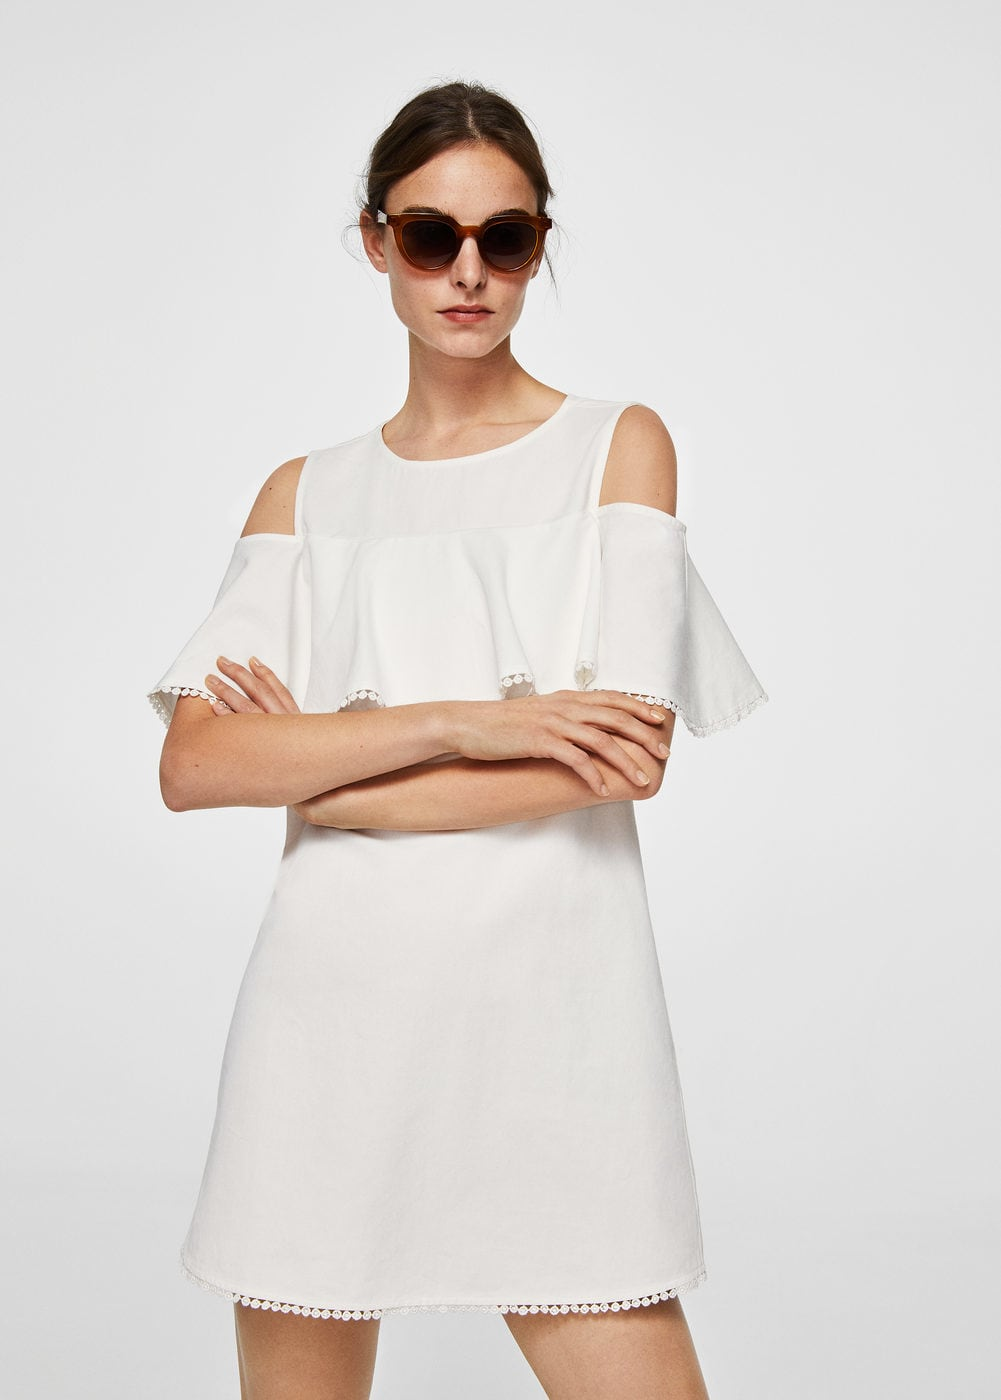 10 Pretty White Day After Dresses For Brides Weddingsonline